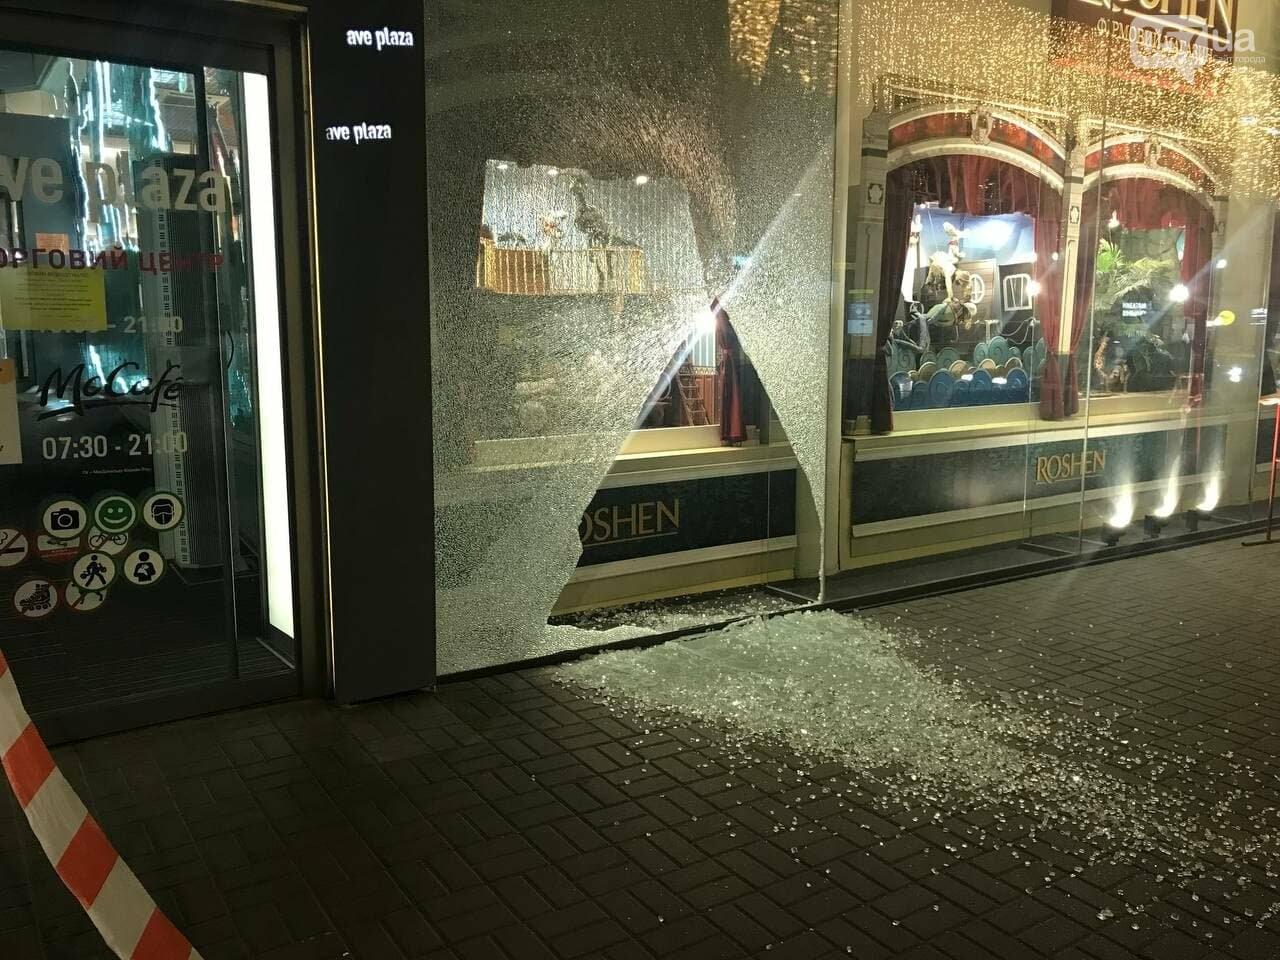 В центре Харькова неизвестные разгромили витрину ТЦ, - ФОТО, фото-3